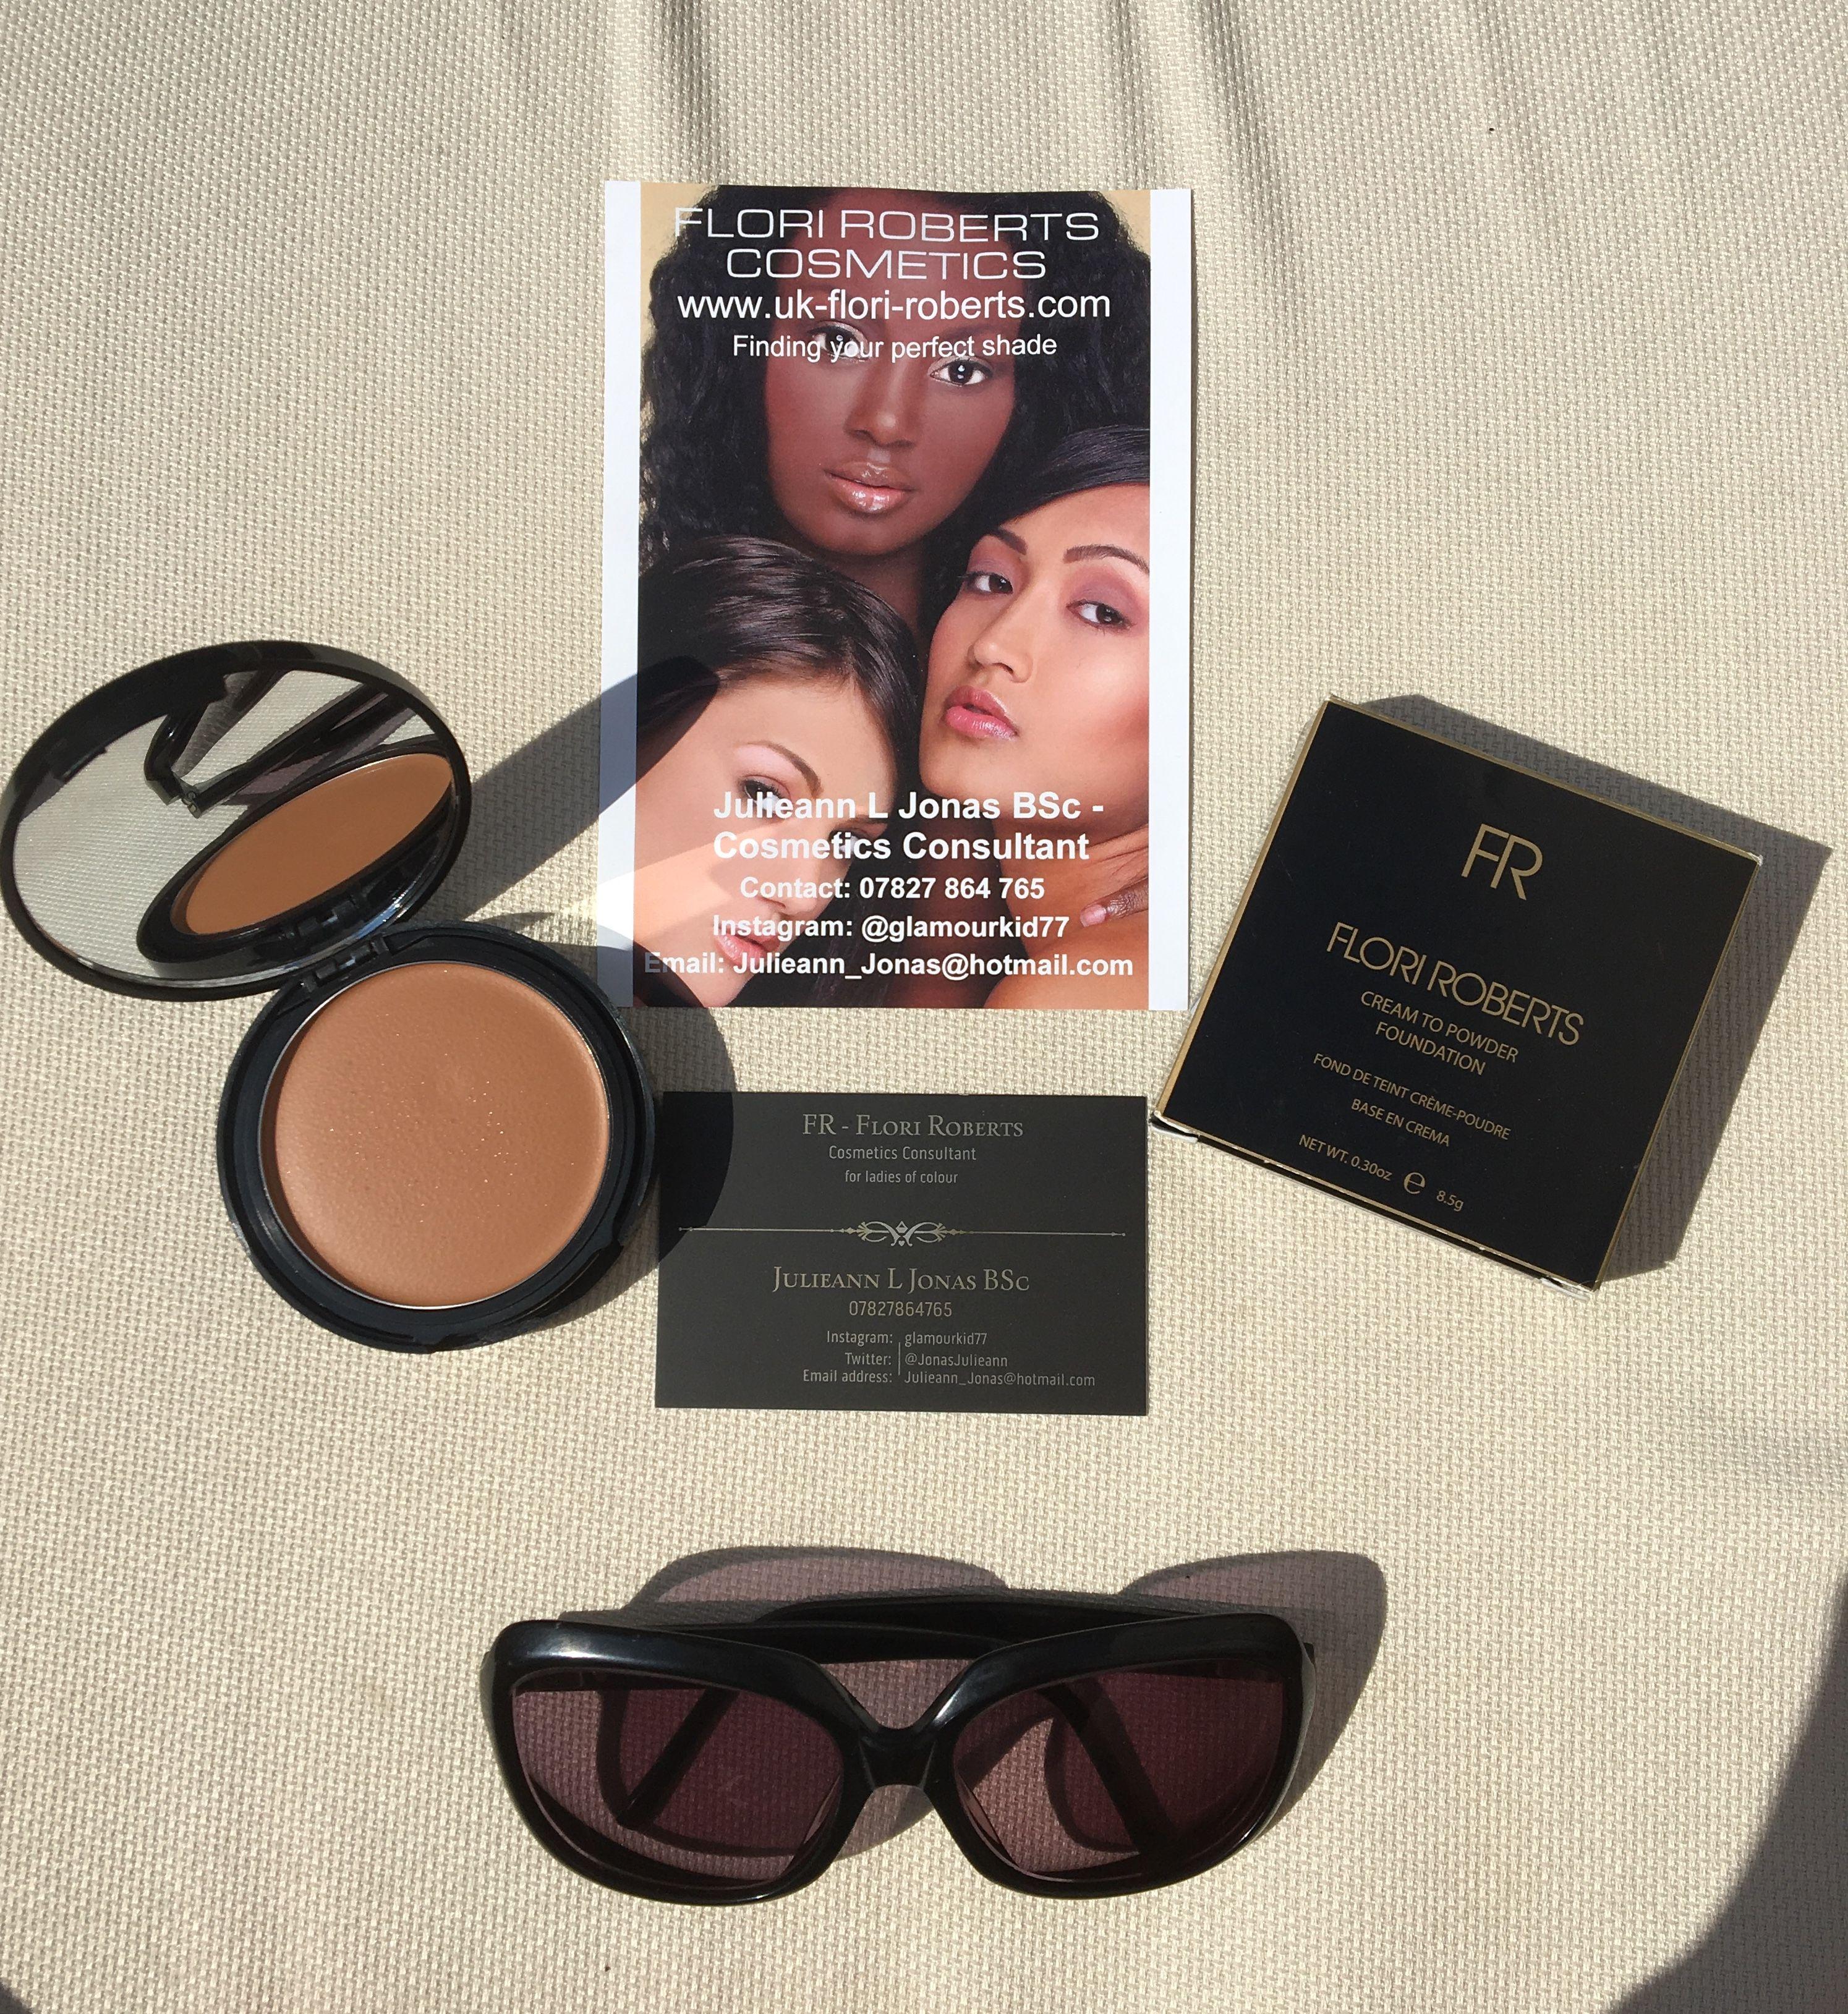 U.K. Flori Roberts Cosmetics It cosmetics foundation